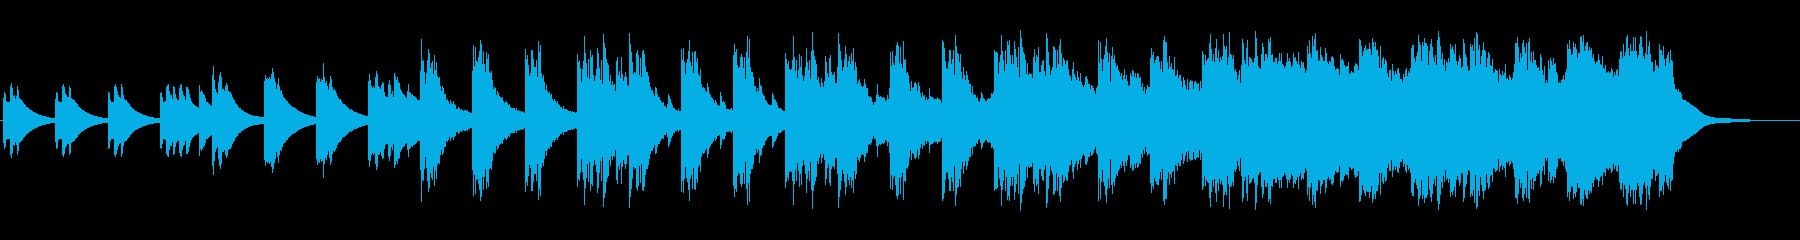 α波が出そうな音を寄せ集めたリラックス曲の再生済みの波形